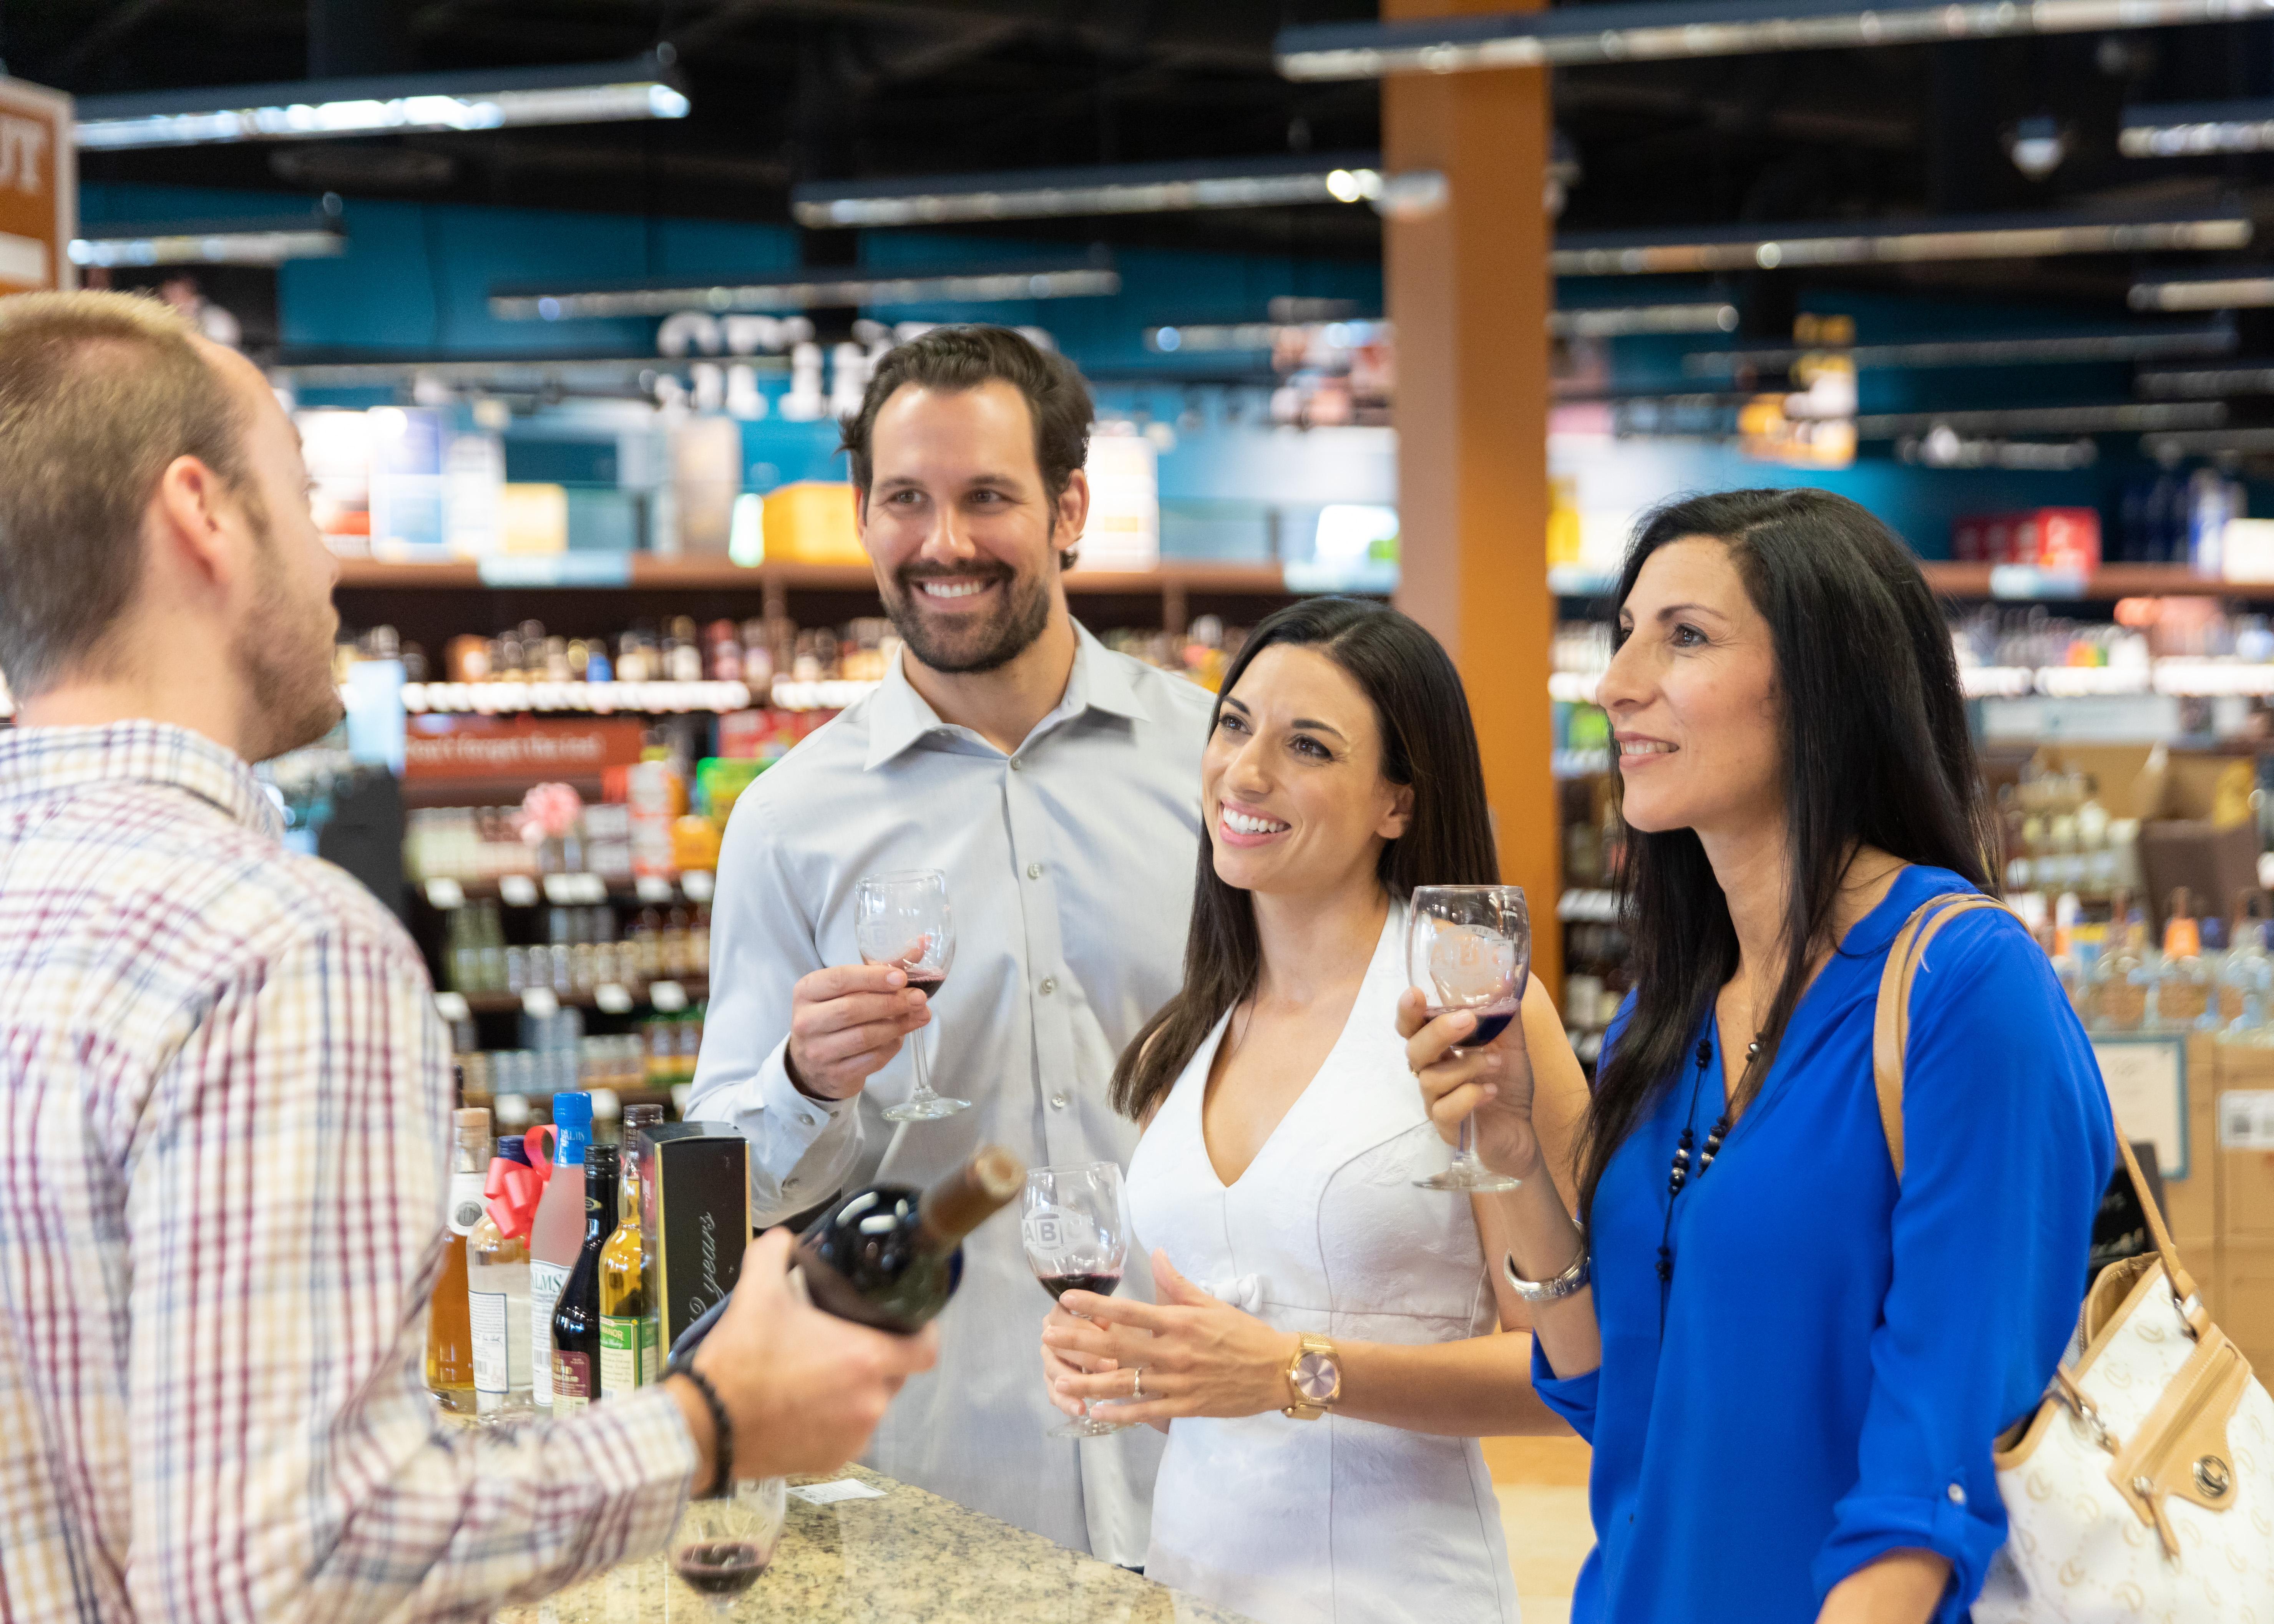 Ft. Myers Premium Wine Tasting